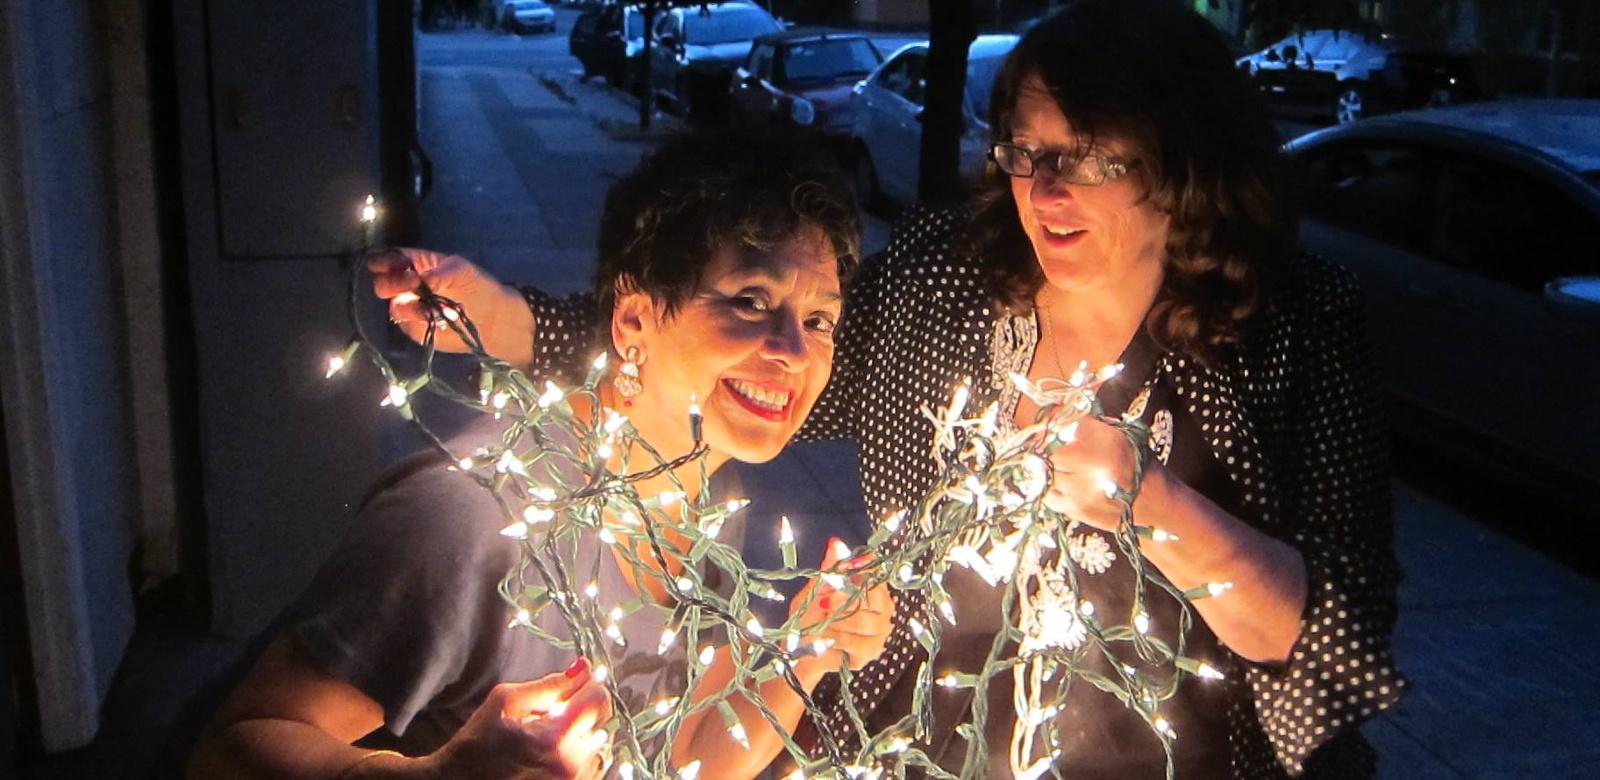 Carolyn & Betsy decorating